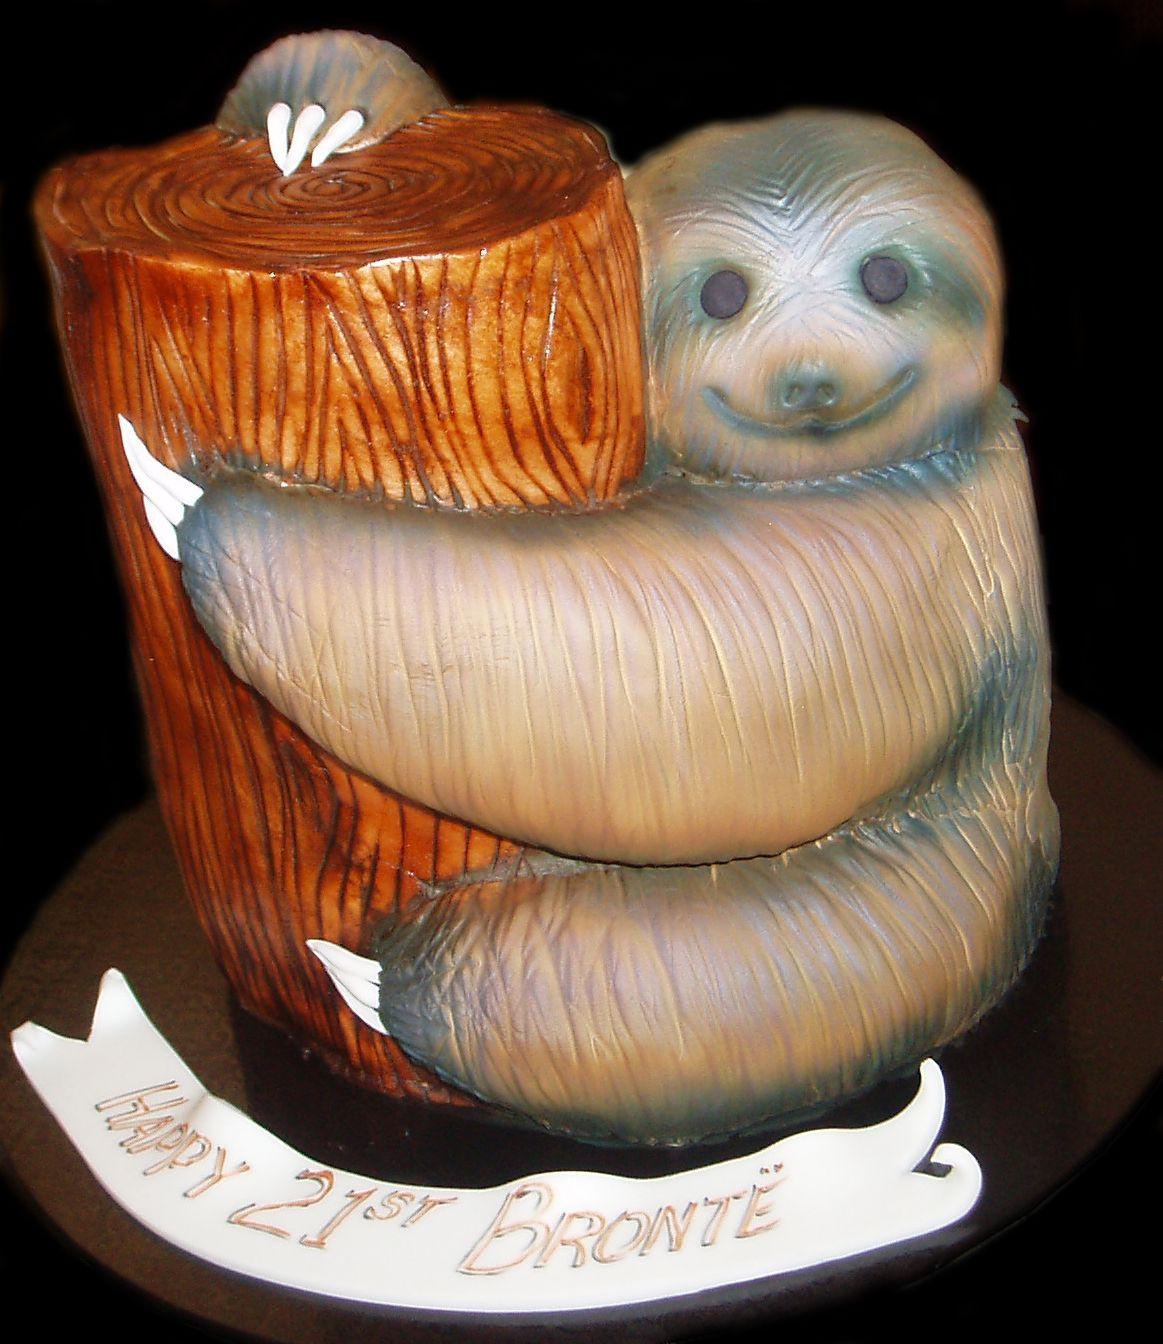 sloth birthday cake decorations